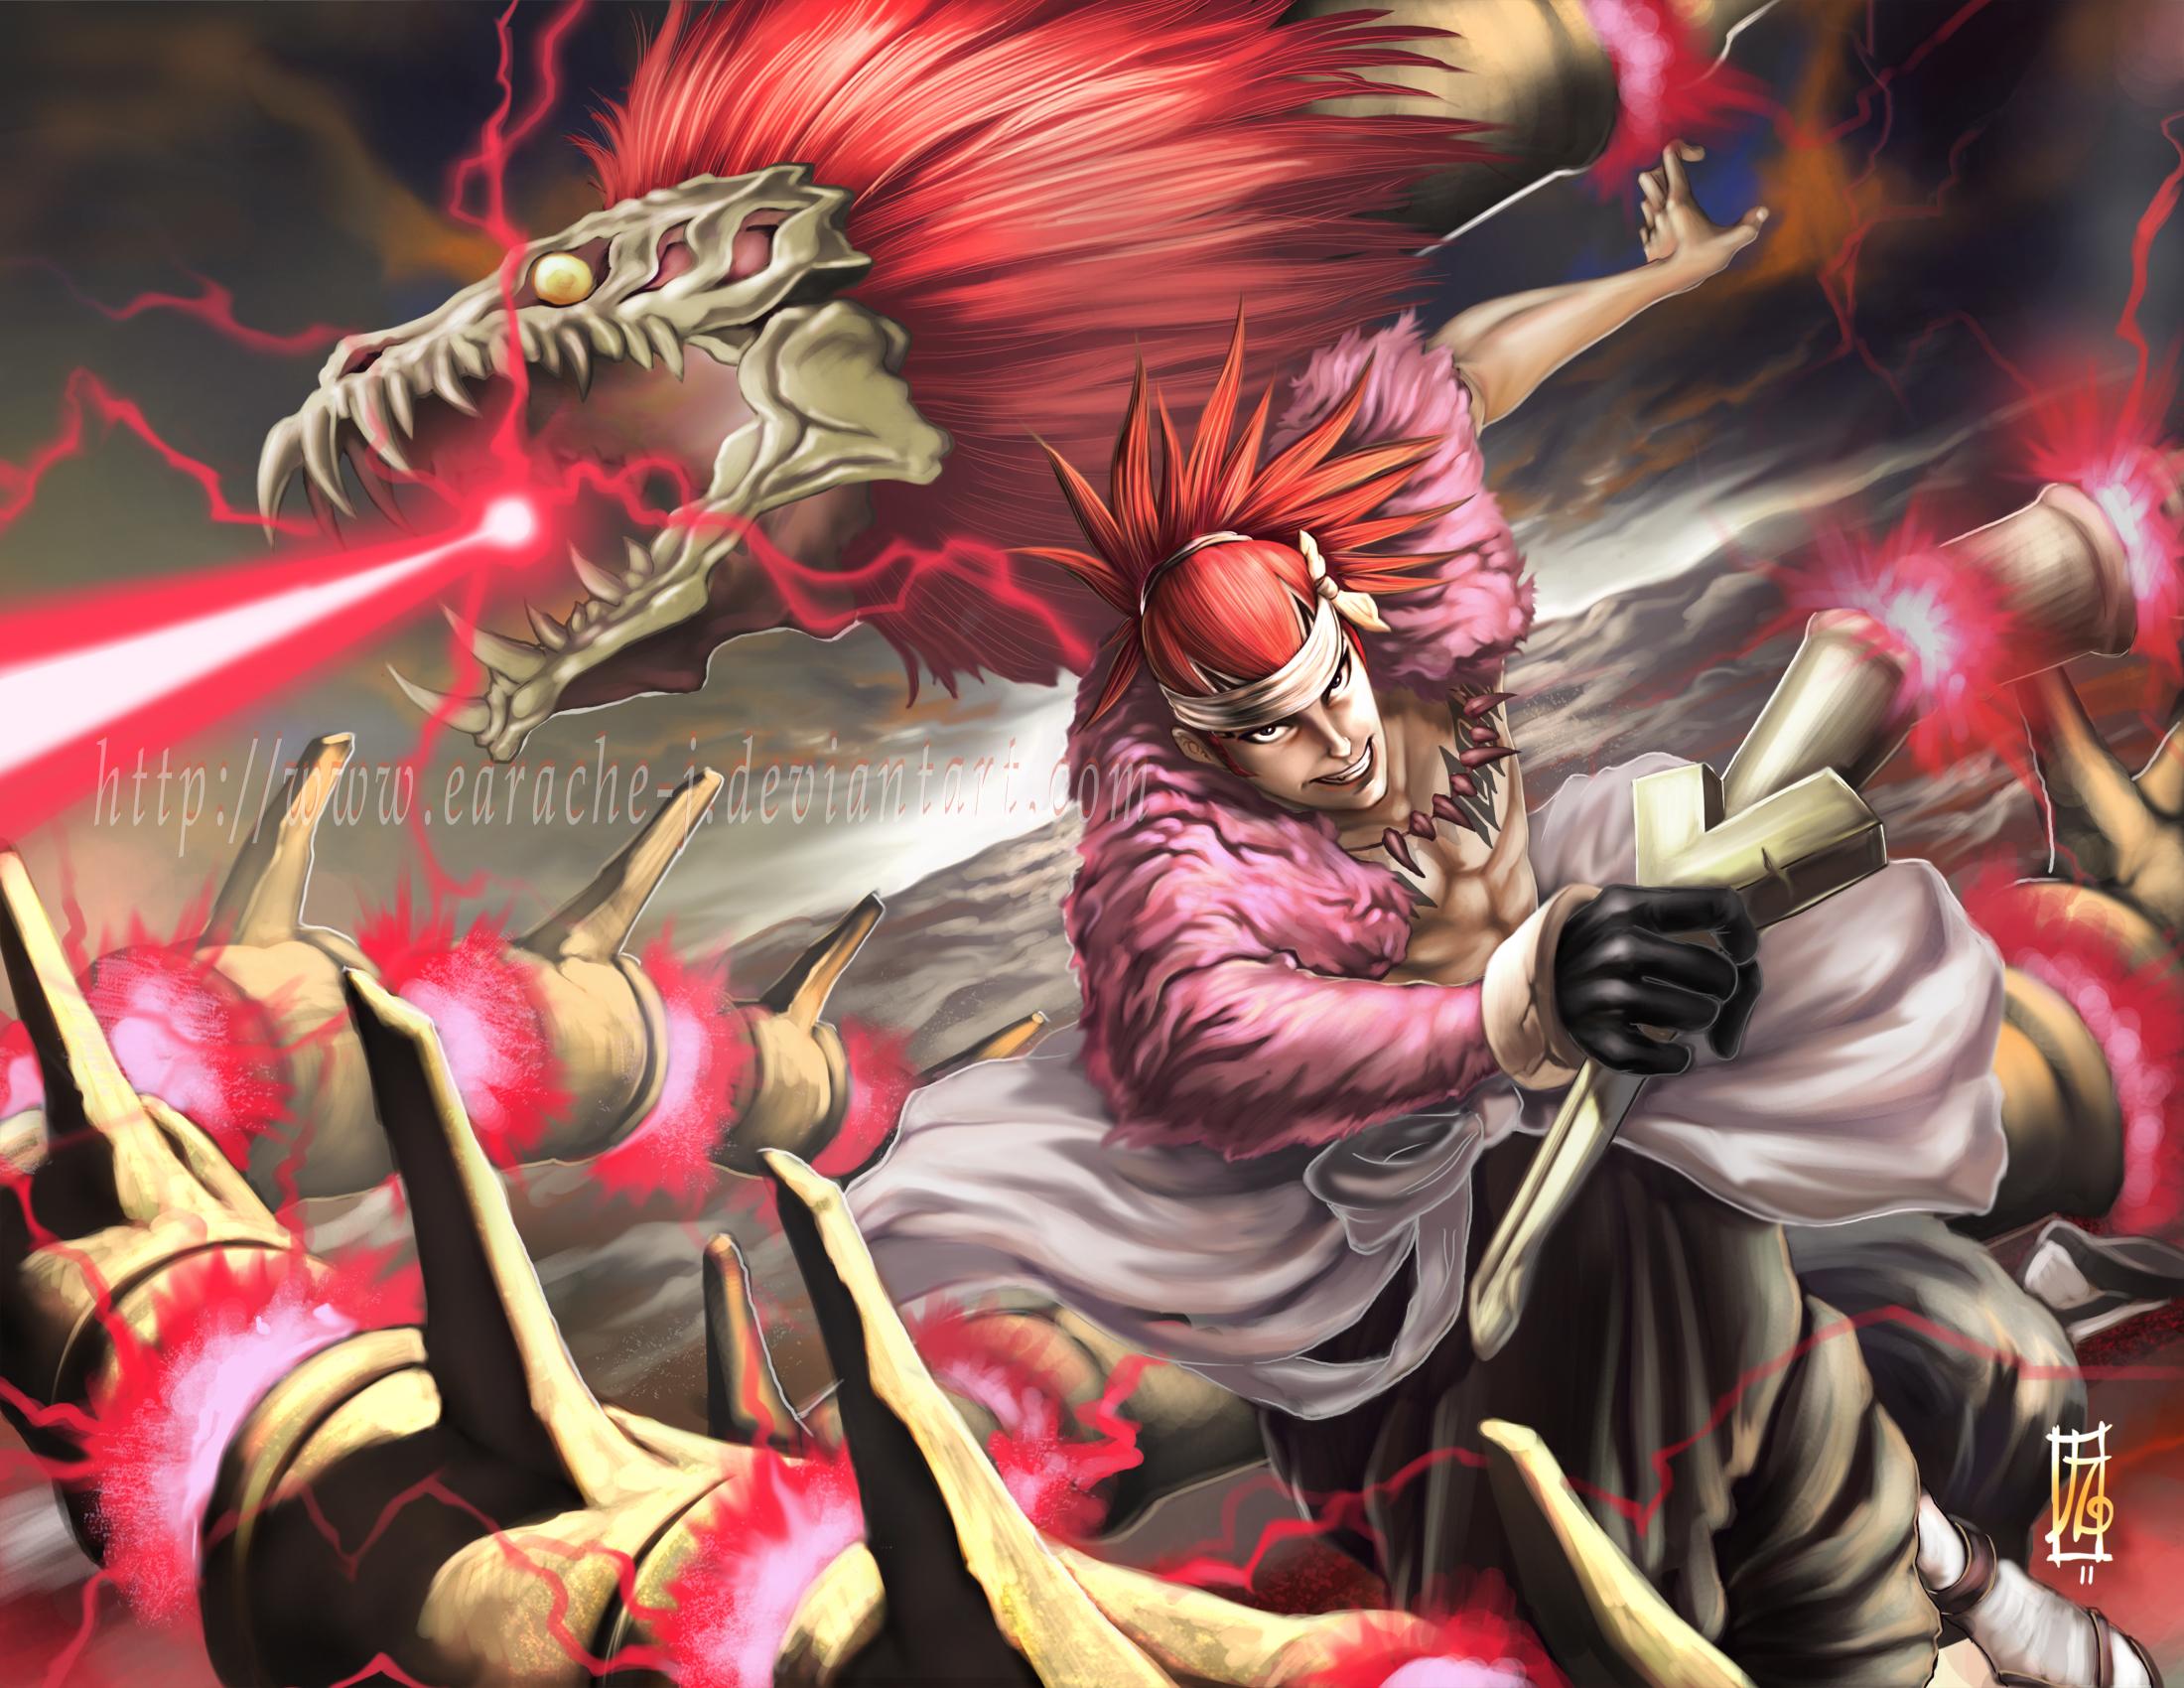 Best 58 Renji Abarai Background on HipWallpaper Bleach Renji 2200x1700